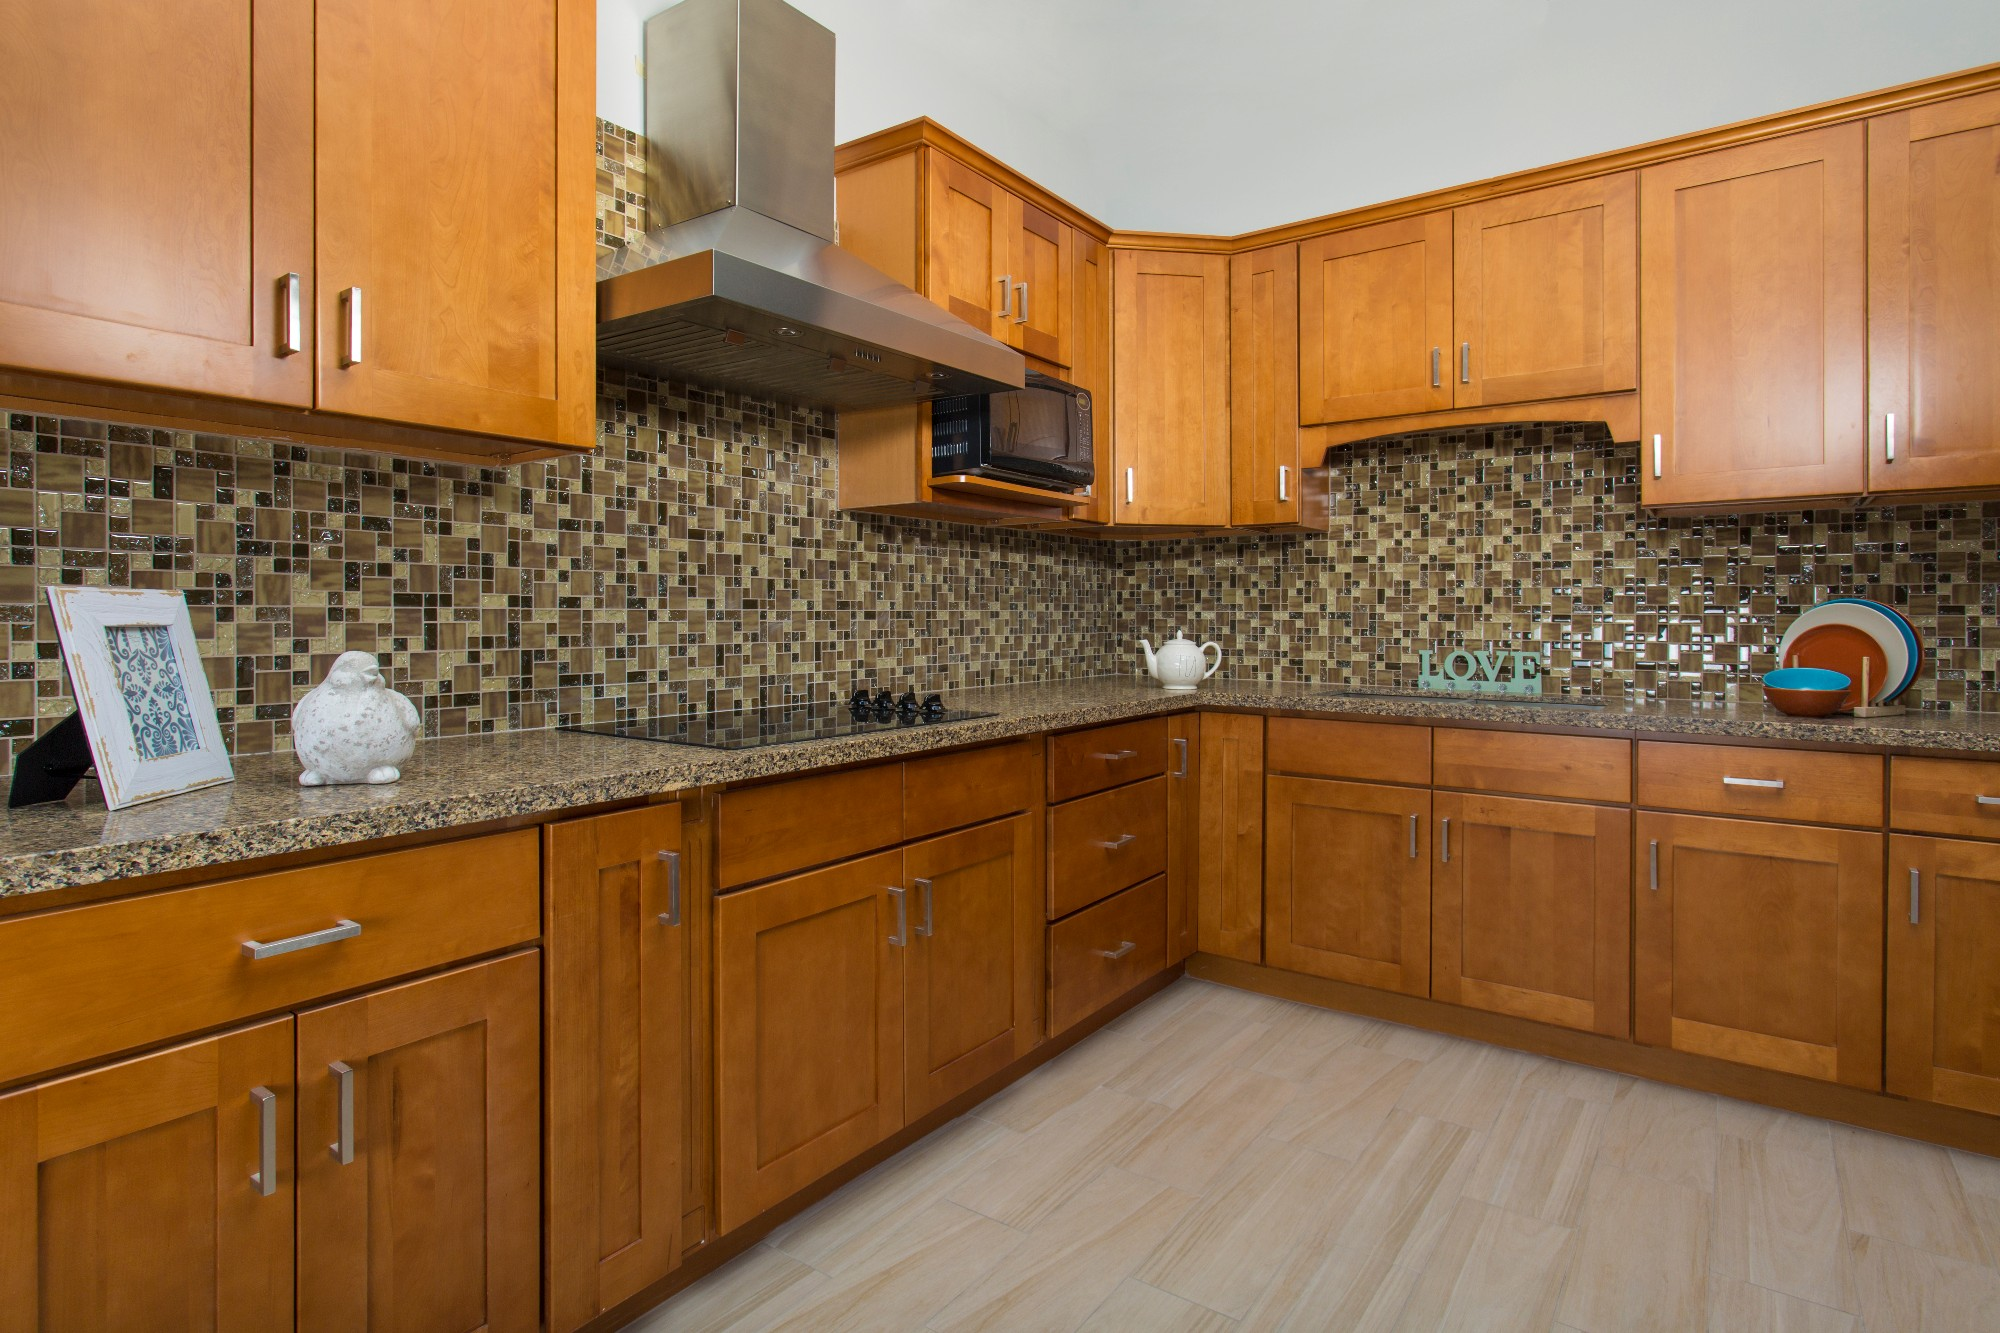 Honey Shaker Solidwood Kitchen Cabinet Manufacturers, Honey Shaker Solidwood Kitchen Cabinet Factory, Supply Honey Shaker Solidwood Kitchen Cabinet